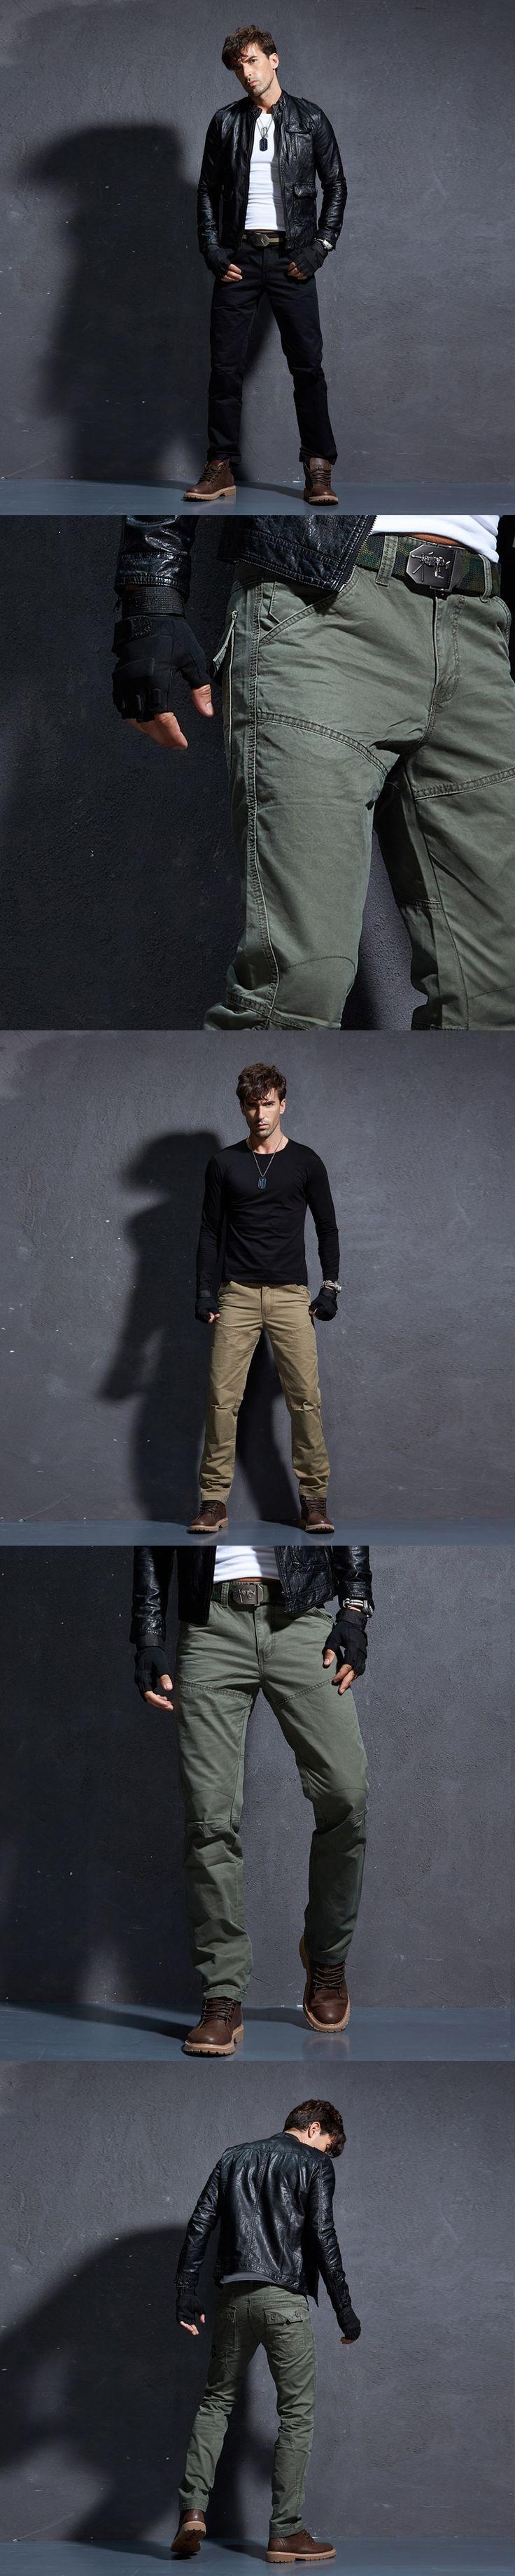 Baggy Cargo Pants Men Men's Military Tactical Pants Mens Militare  Winter Warm Denim Work Trousers.FA06